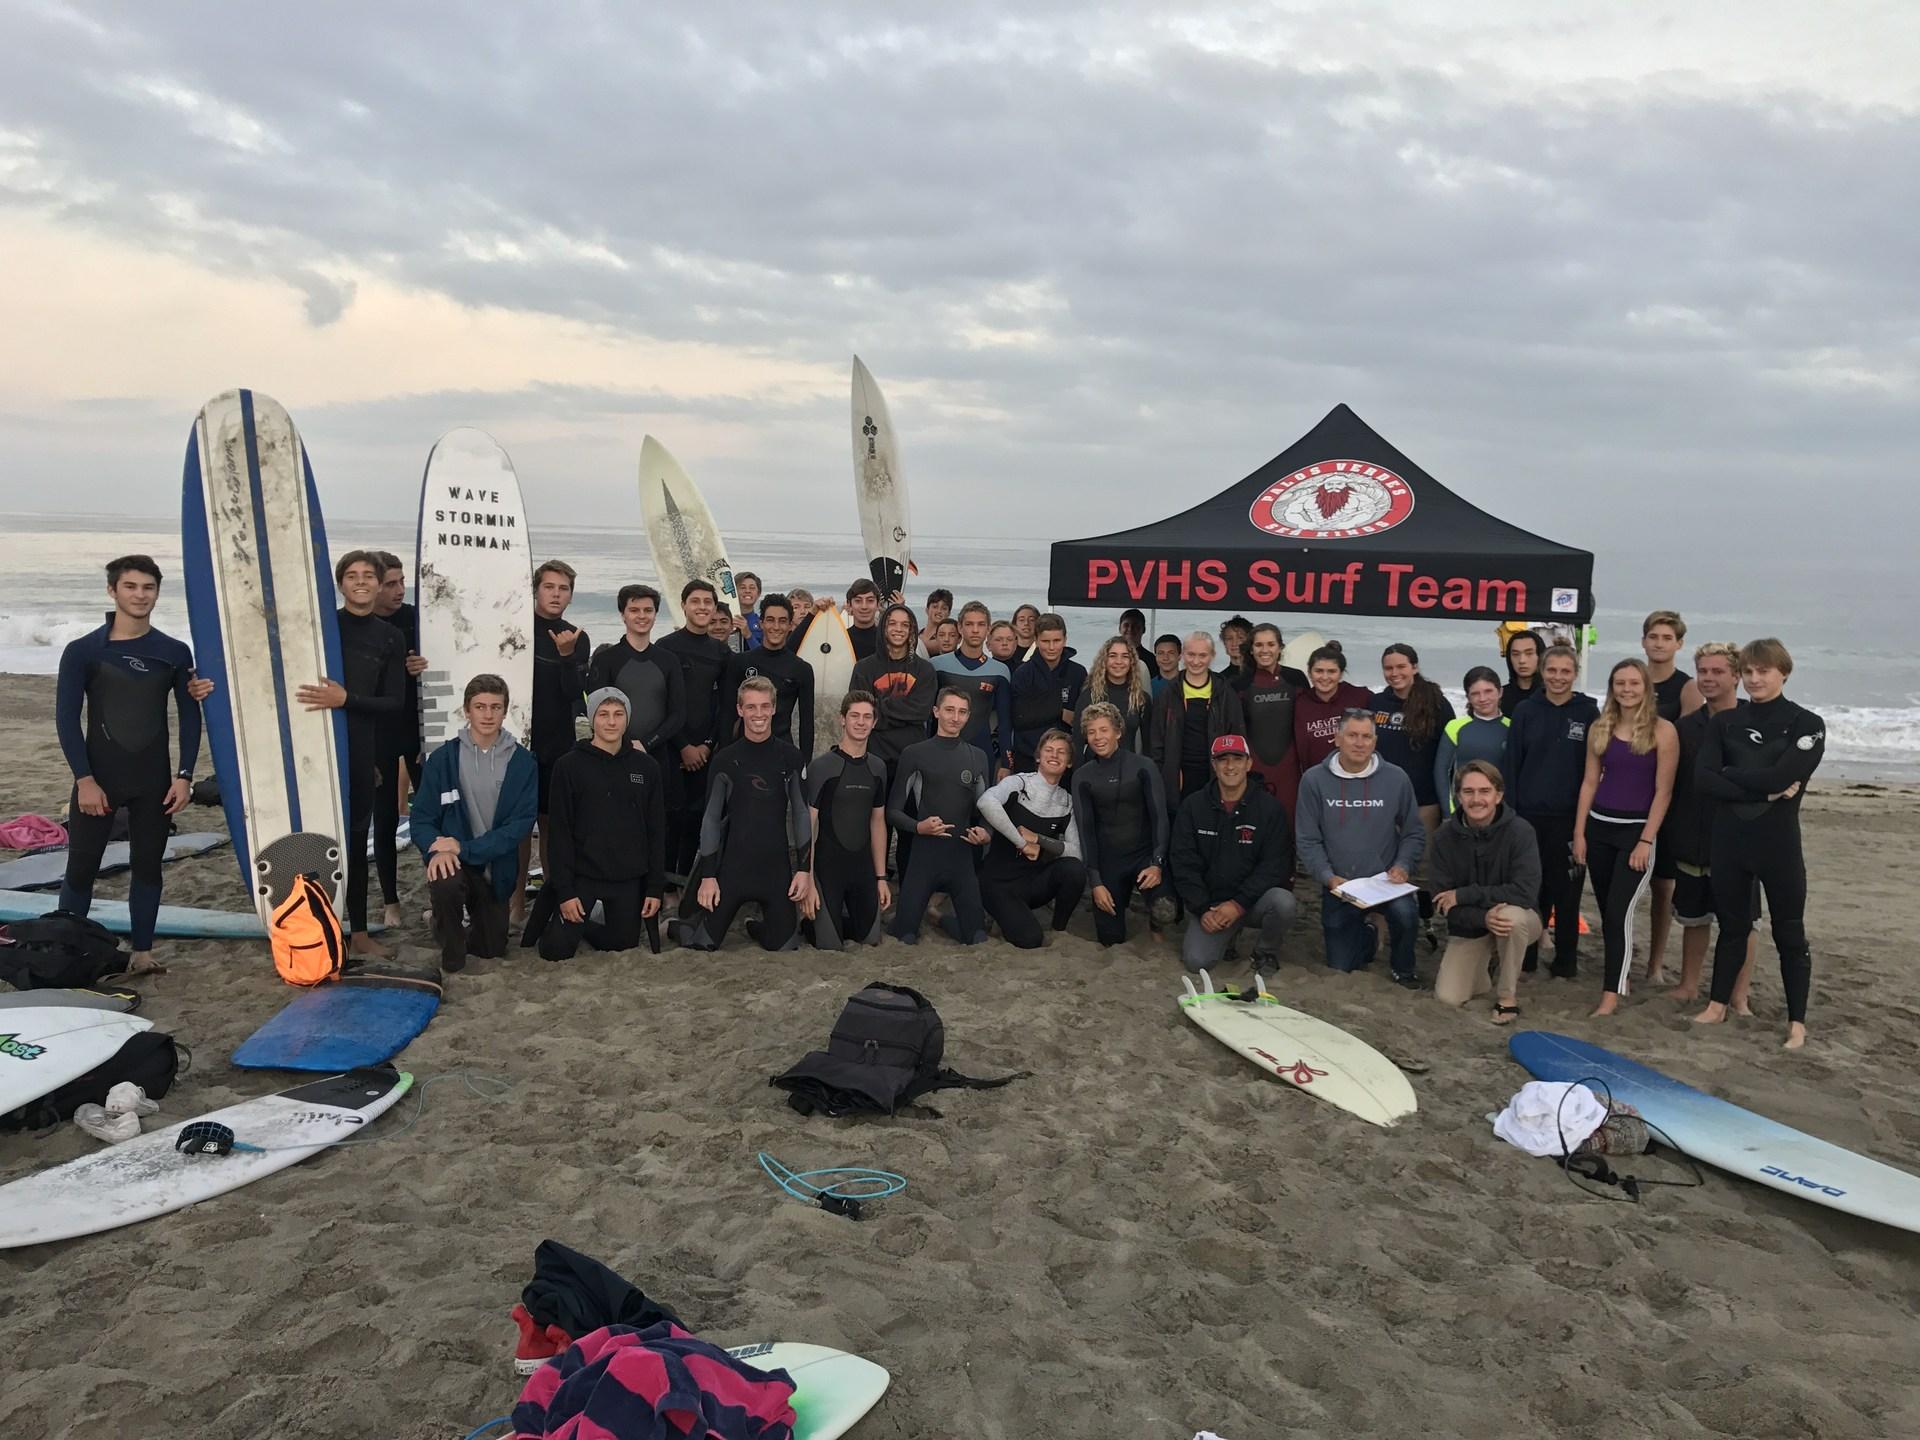 PVHS Surf Team